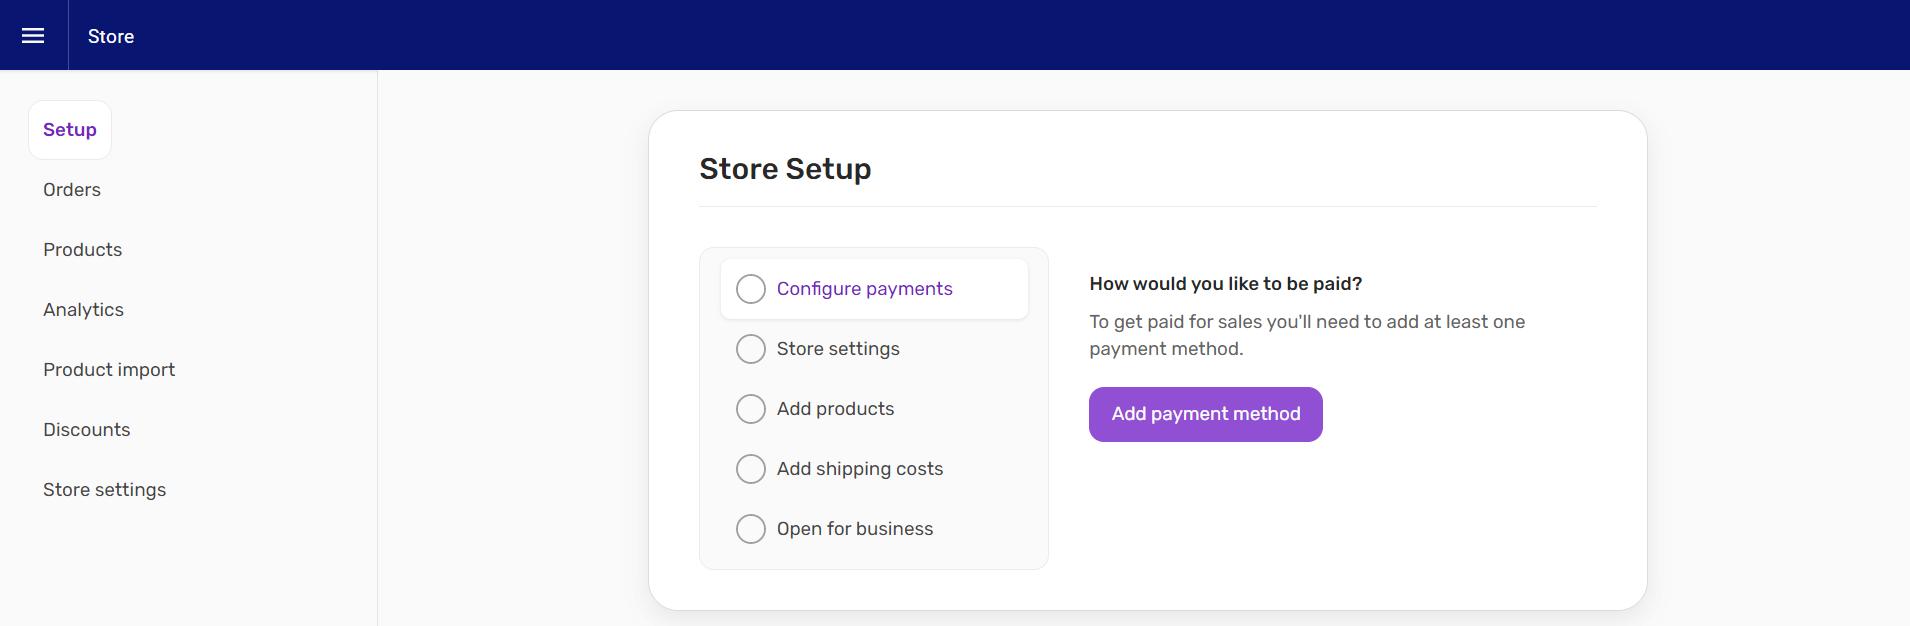 Screenshot of store setup screen in Website Builder